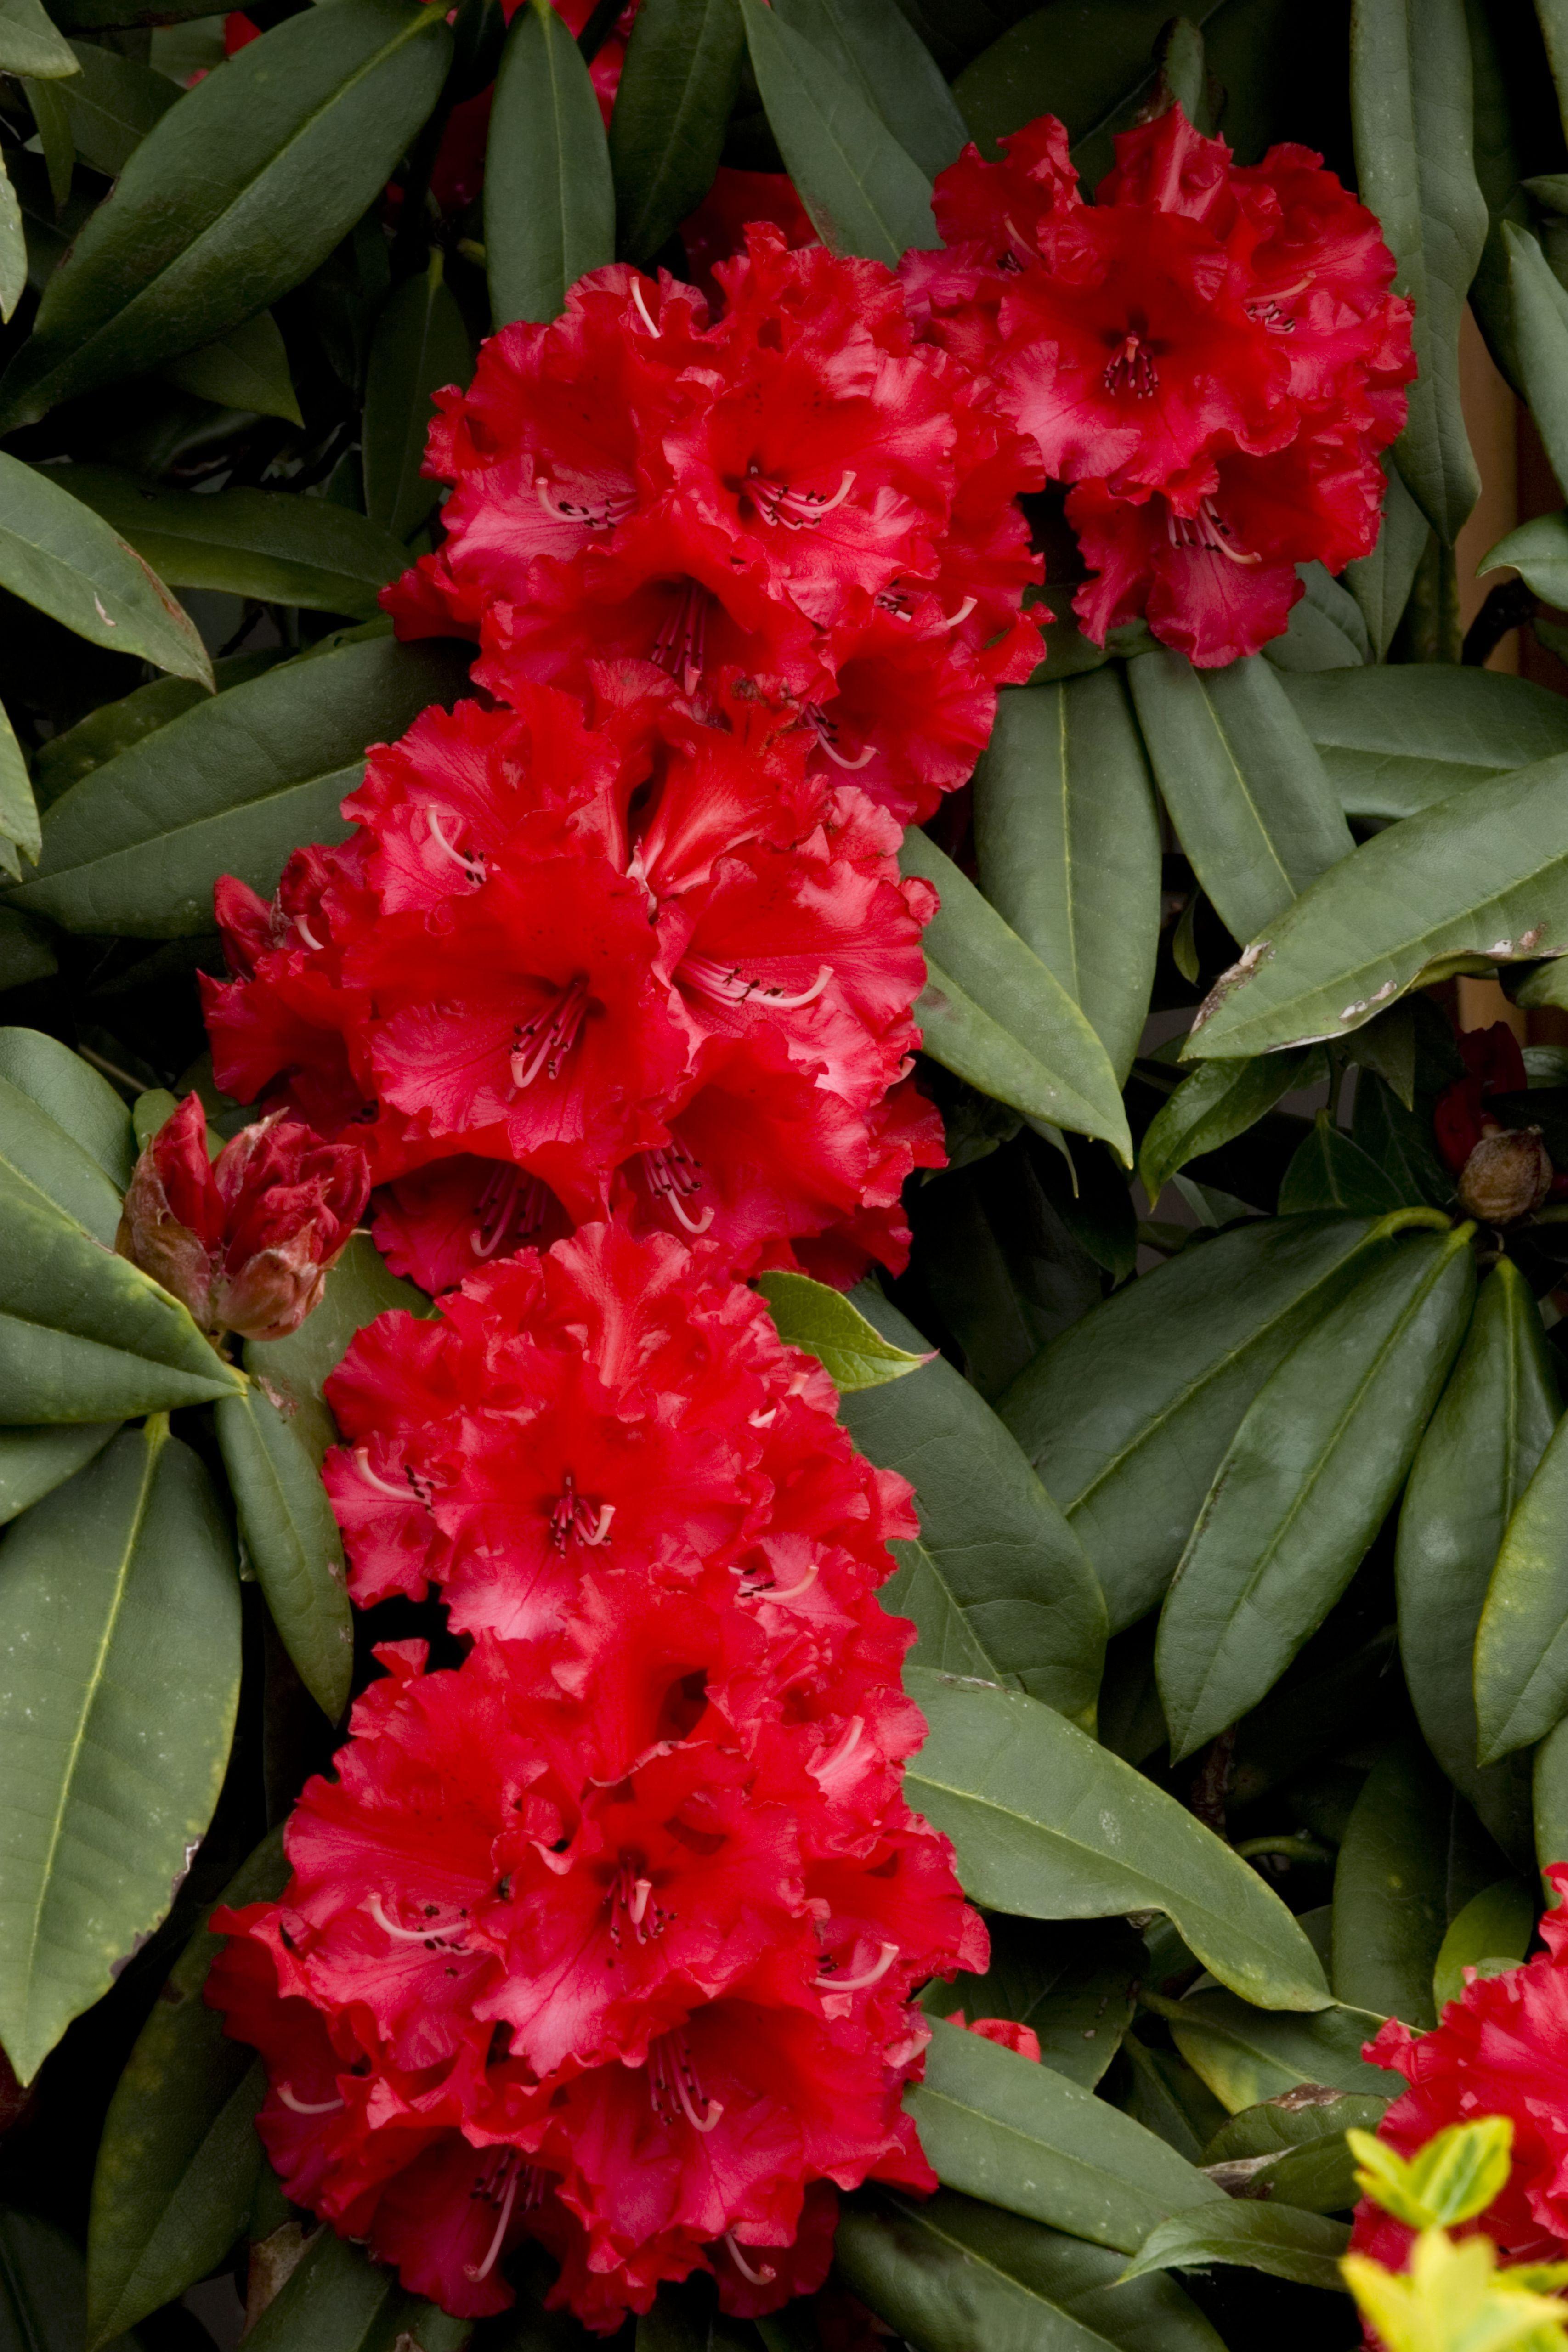 Taurus Rhododendron Monrovia Taurus Rhododendron Fiori Vasi